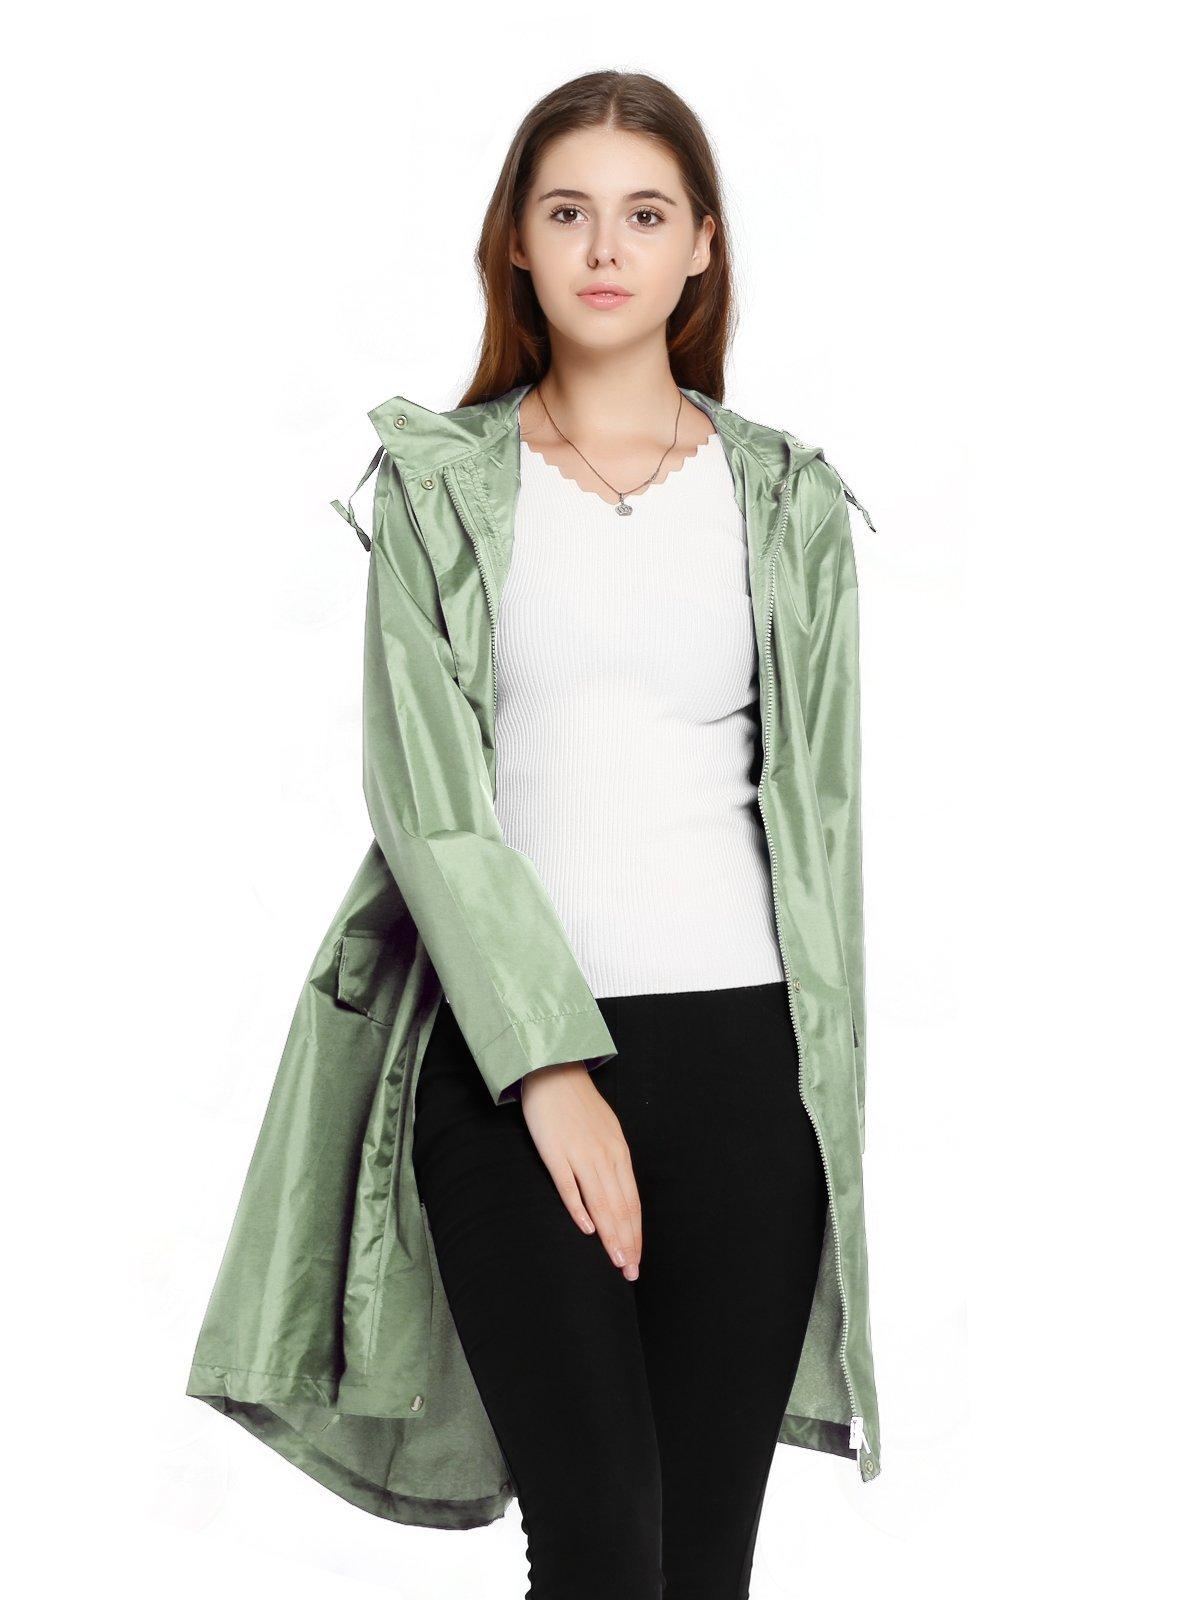 Spring Fever Womens Long Lightweight Raincoat Outdoor Hooded Packable Waterproof Rain Jacket Green L